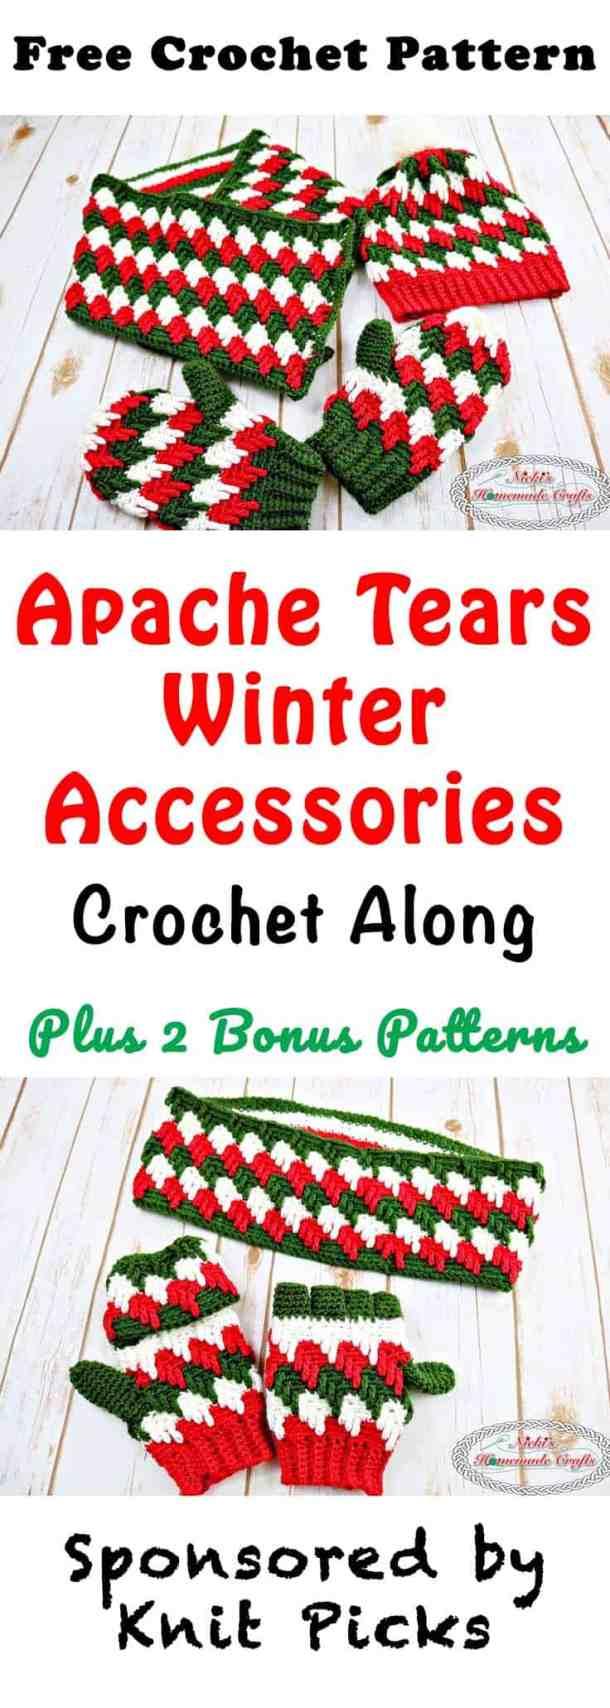 Apache Tears Winter Accessories Crochet Along-Free Crochet Patterns by Nicki's Homemade Crafts, Sponsored by Knit Picks #crochet #crochetalong #freecrochetpattern #apachetears